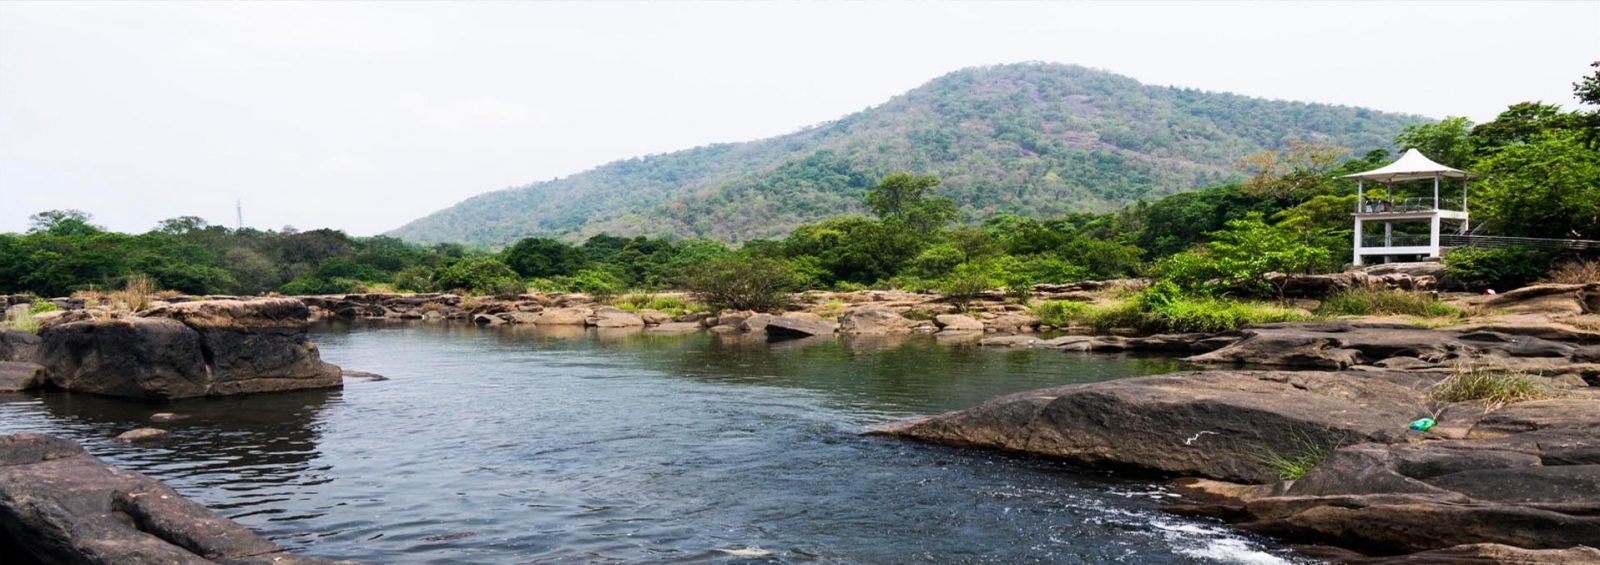 Ezhattumugham River